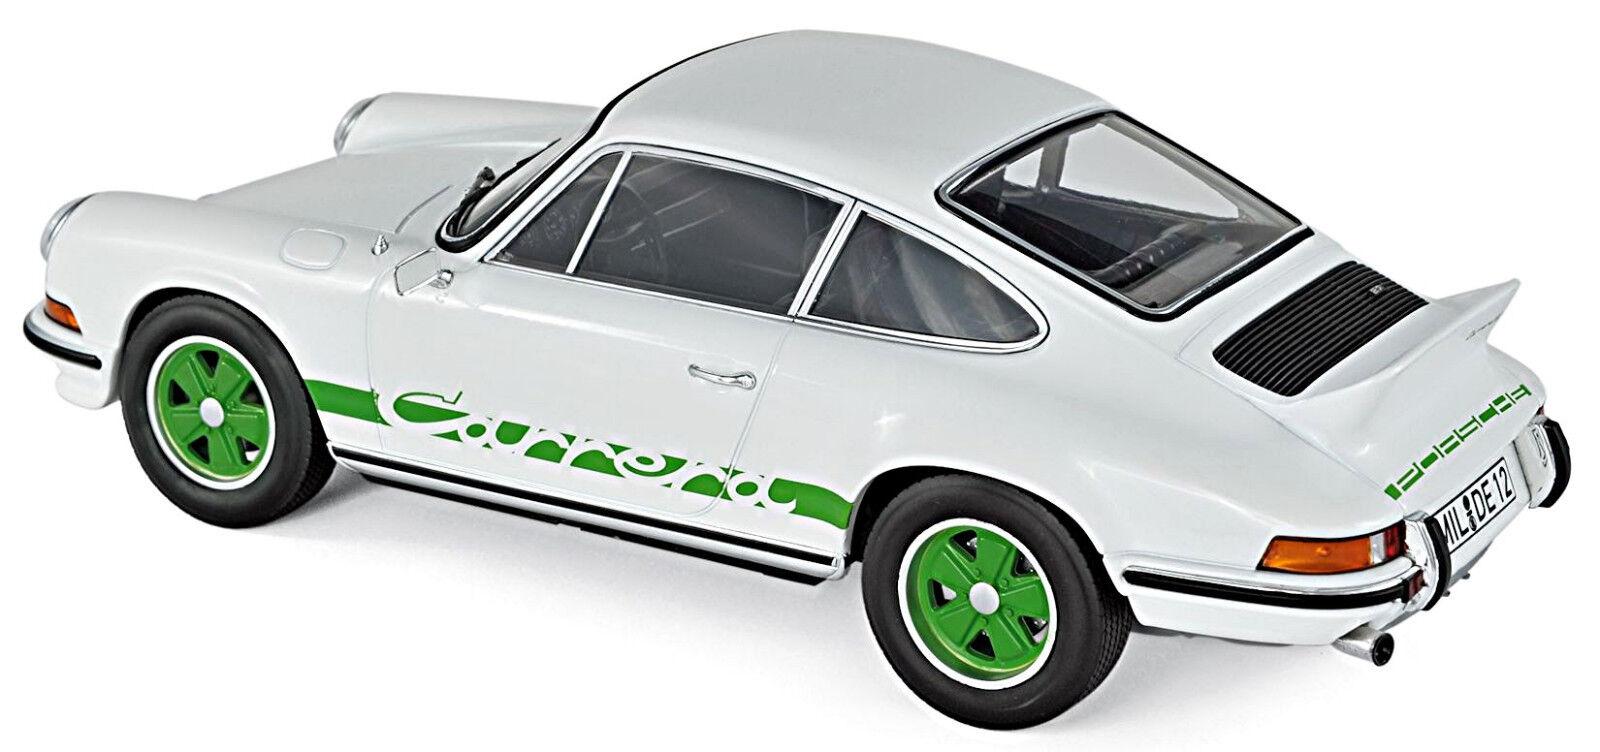 Porsche 911 Carrera Rs 2.7 Coupè 1973 Bianco green Bianco green 1 18 Norev